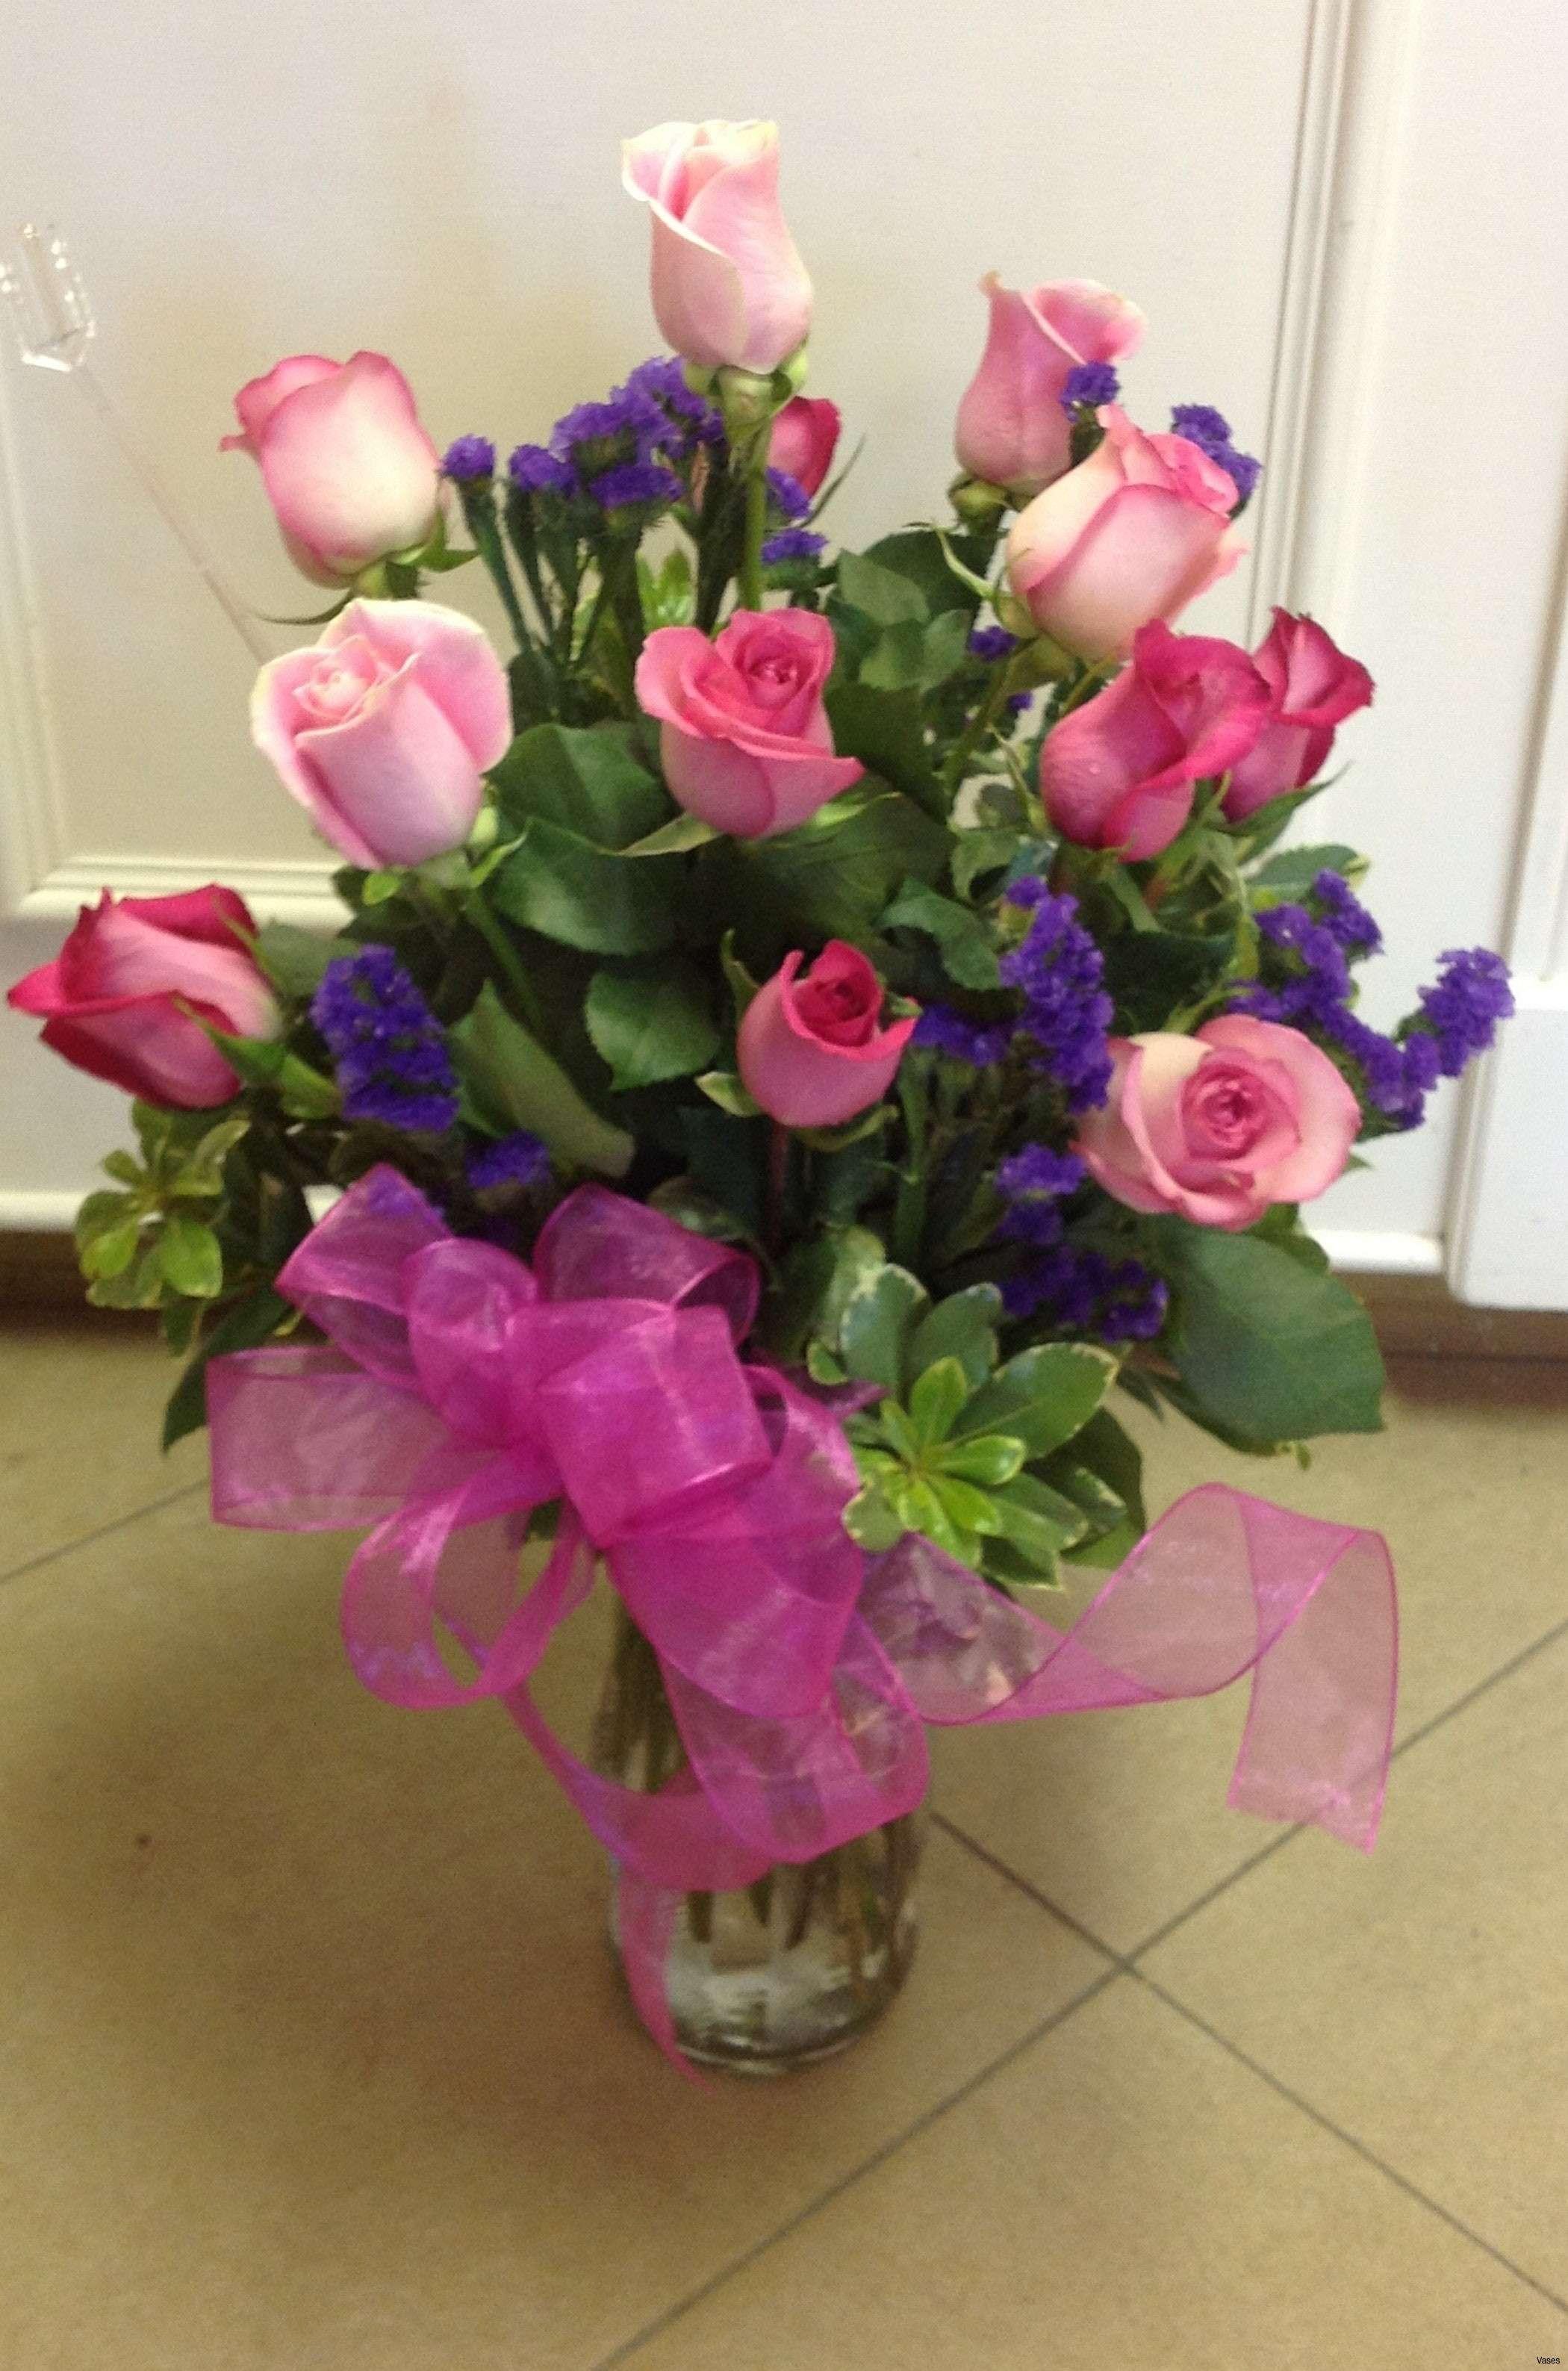 15 cheap and easy diy vase filler ideas 3h vases flower i 0d fillers design ideas